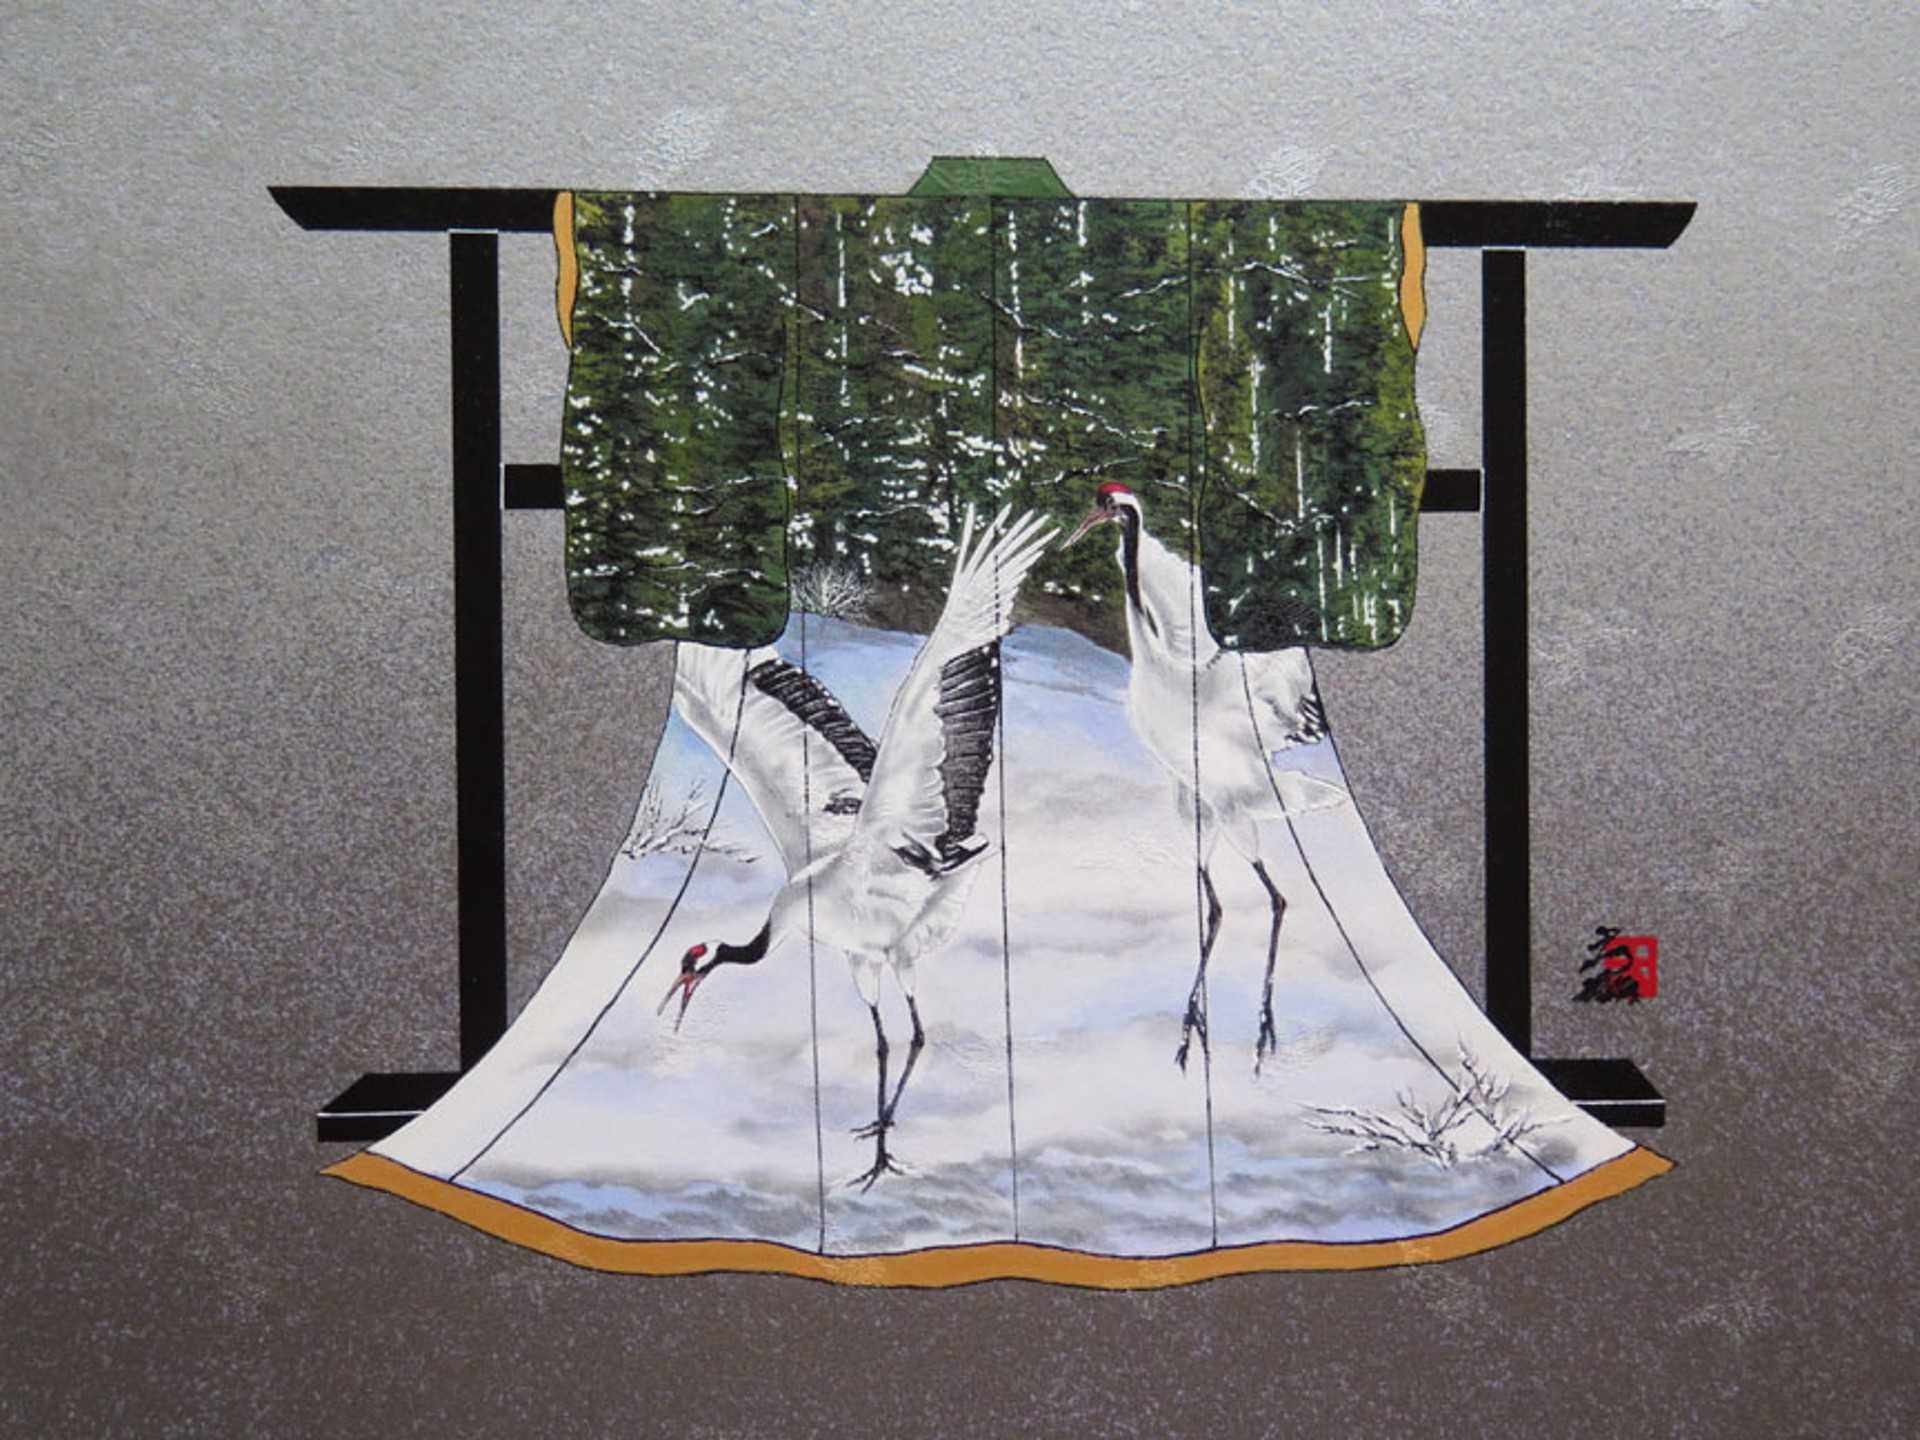 Dancing Crane 3 Tancyouzuru by Hisashi Otsuka